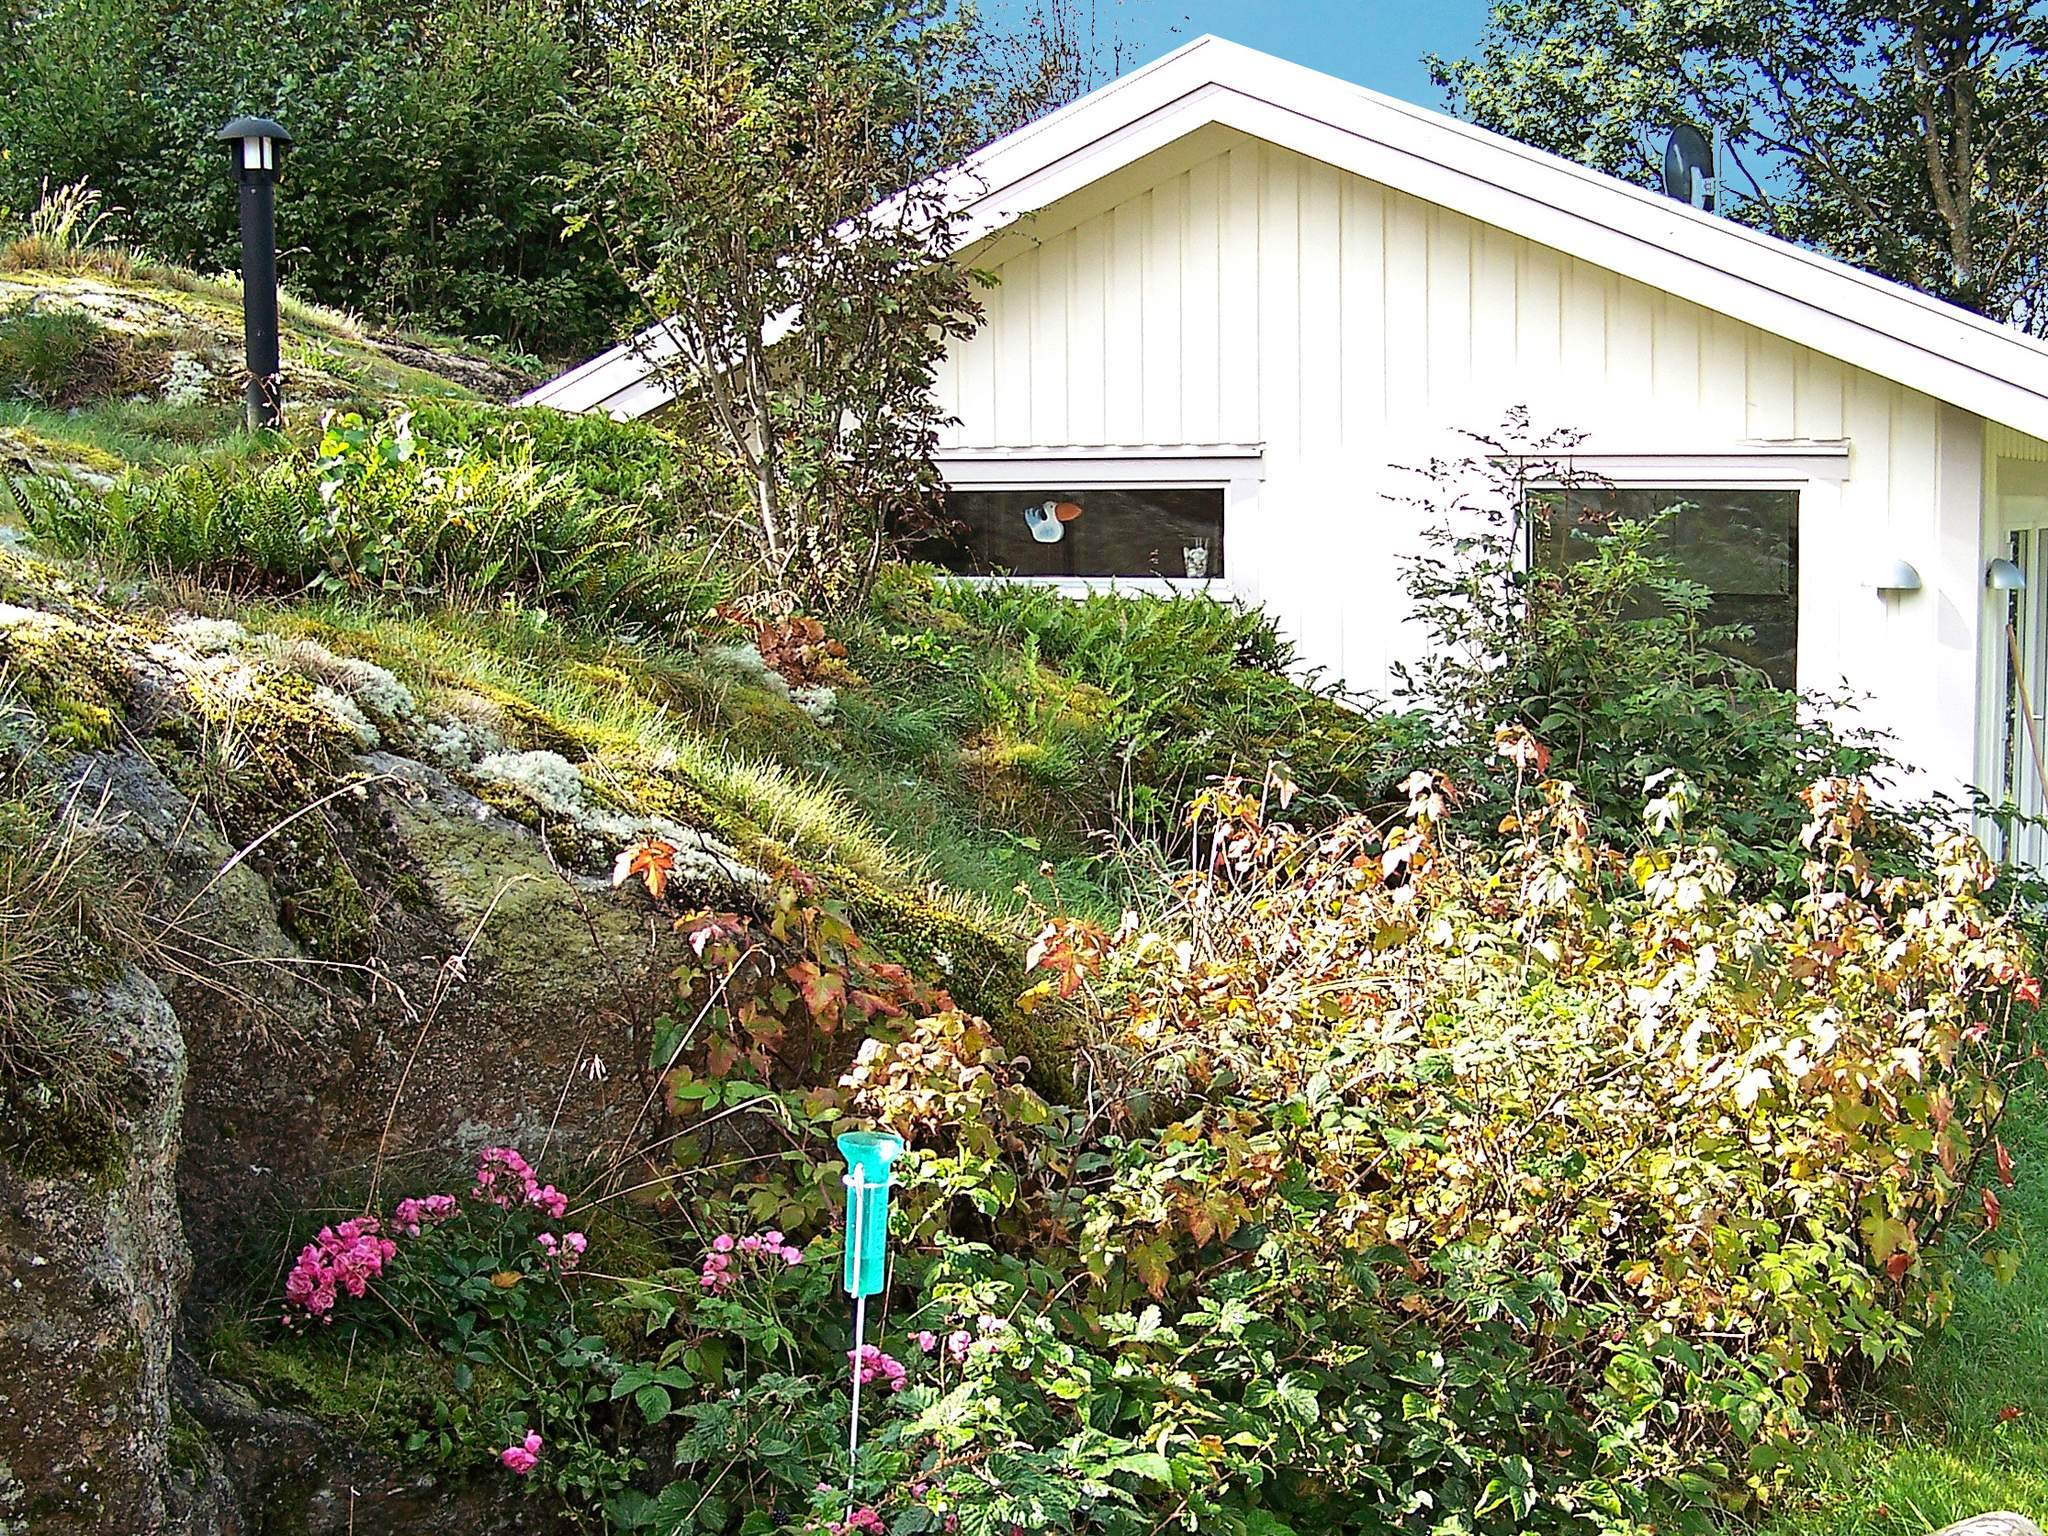 Ferienhaus Tjörn/Huseberg (672440), Kållekärr, Tjörn, Westschweden, Schweden, Bild 10